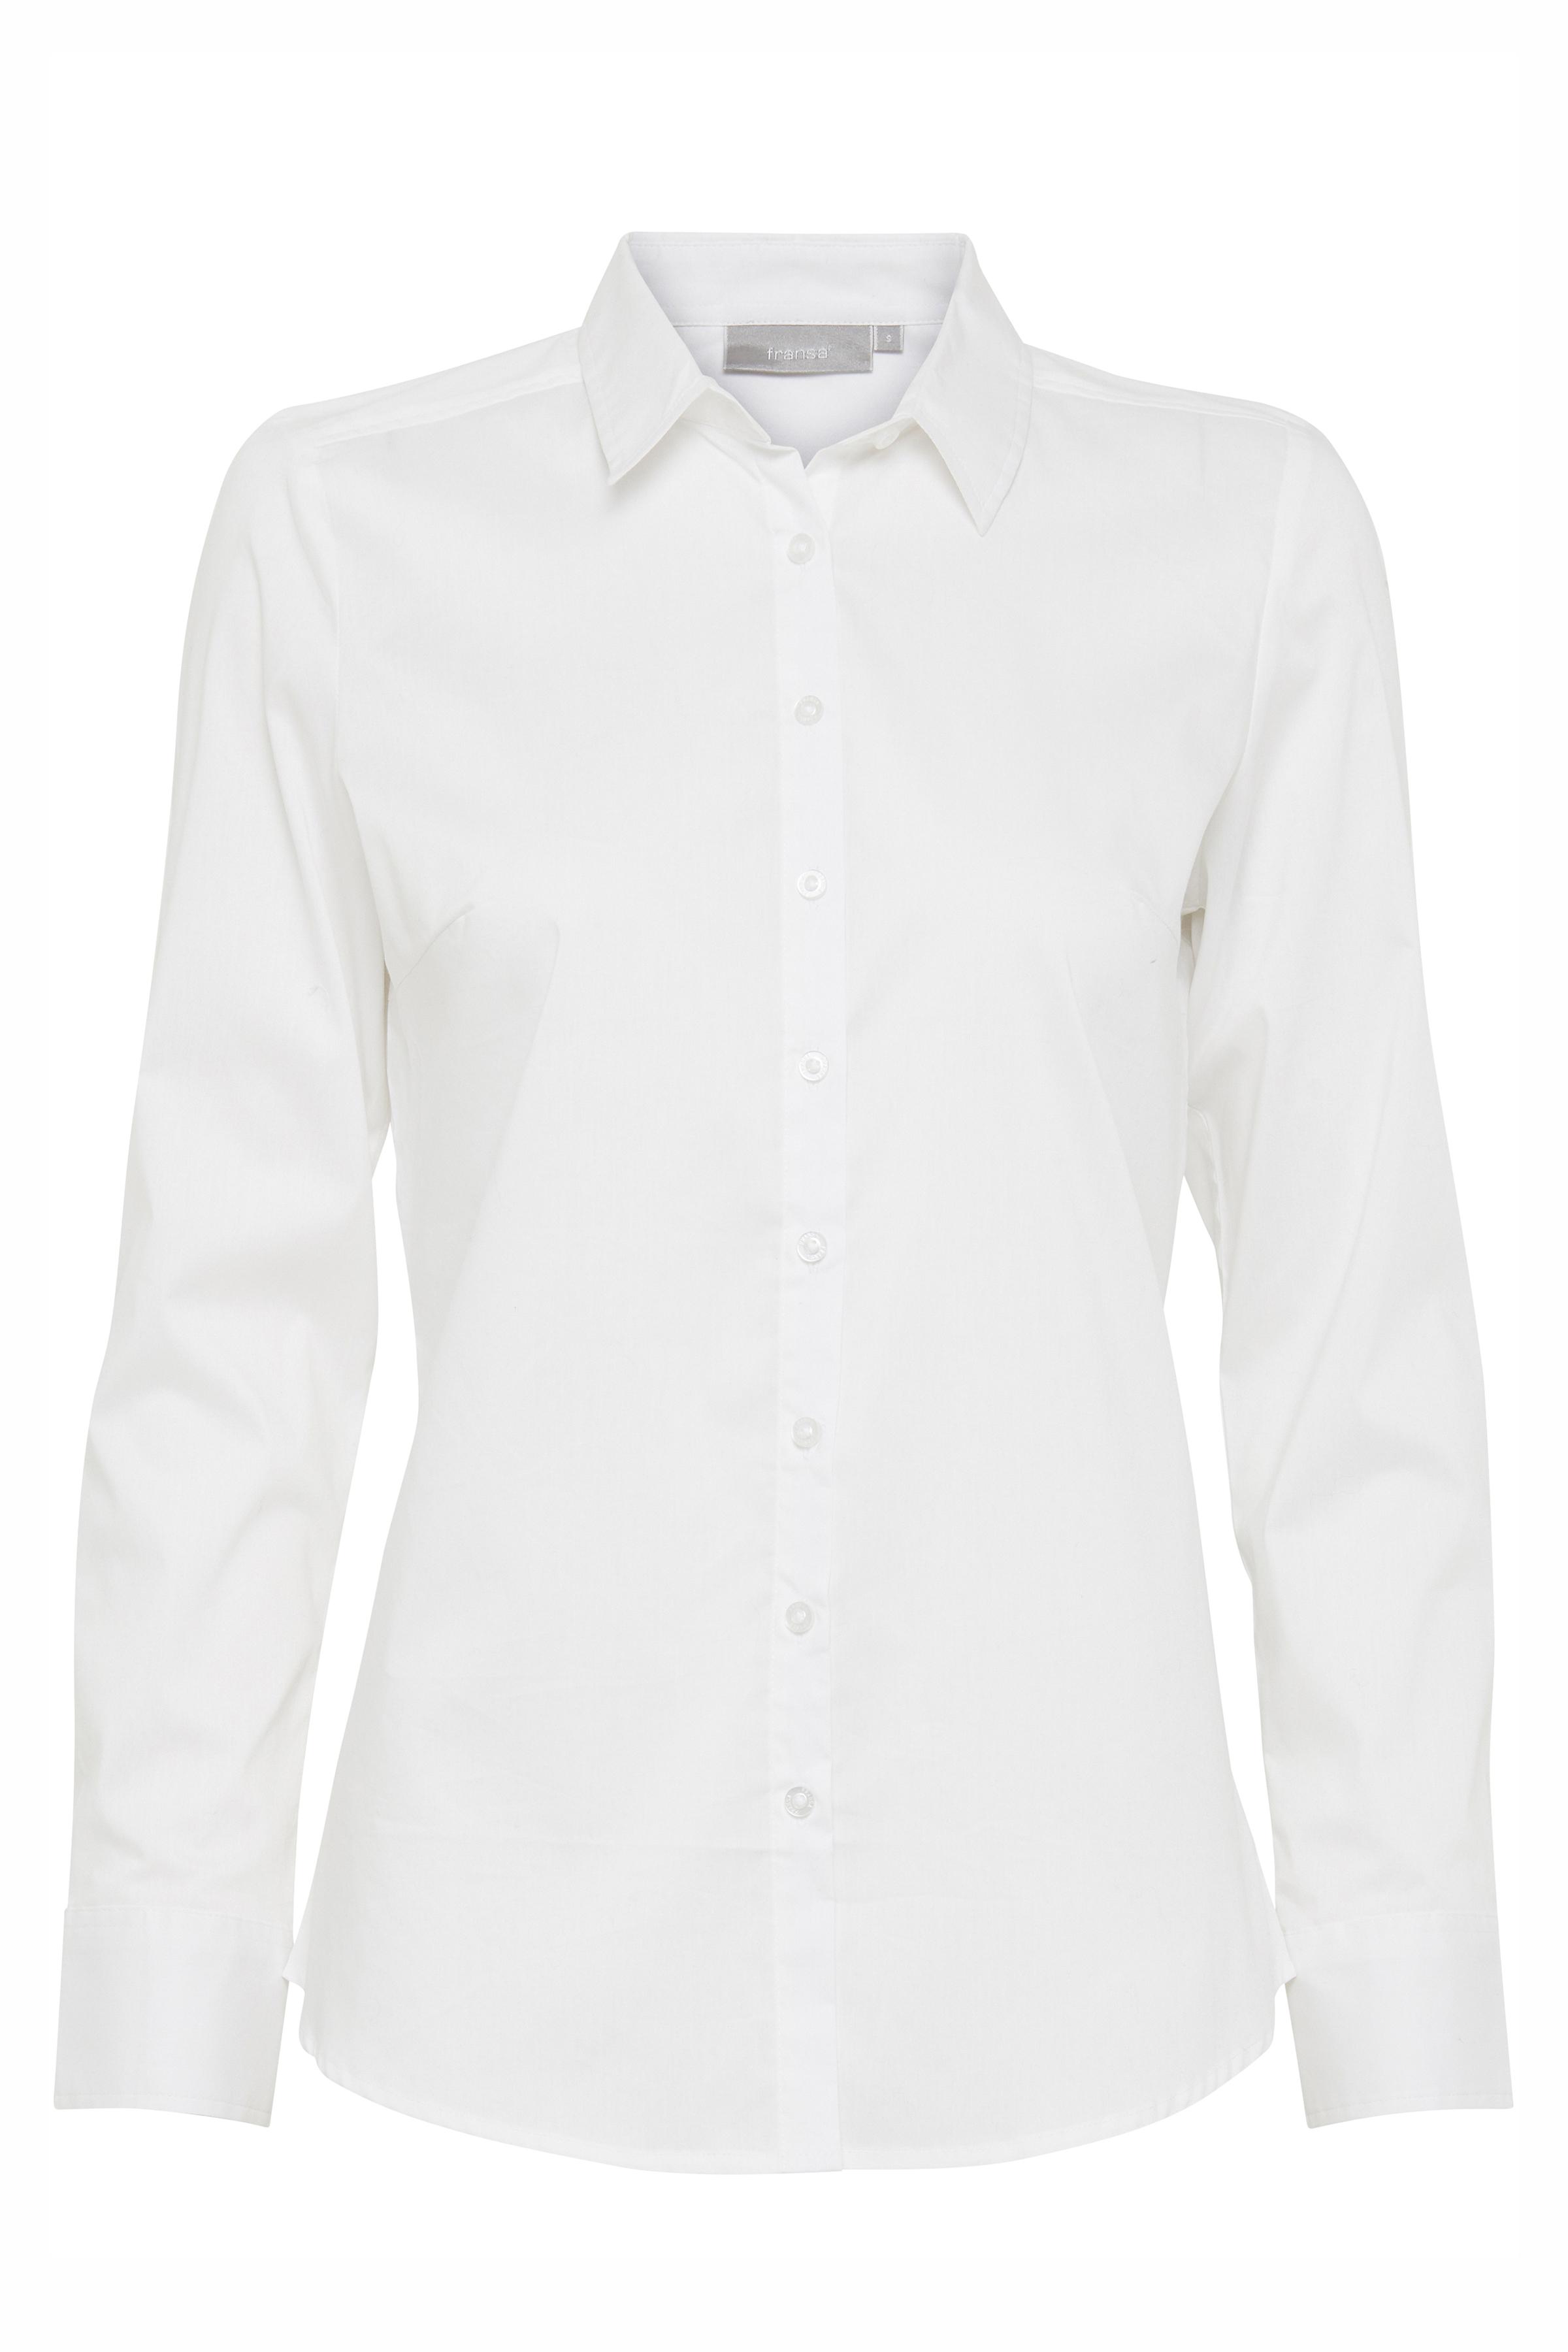 Image of Fransa Dame Langærmet skjorte - Hvid